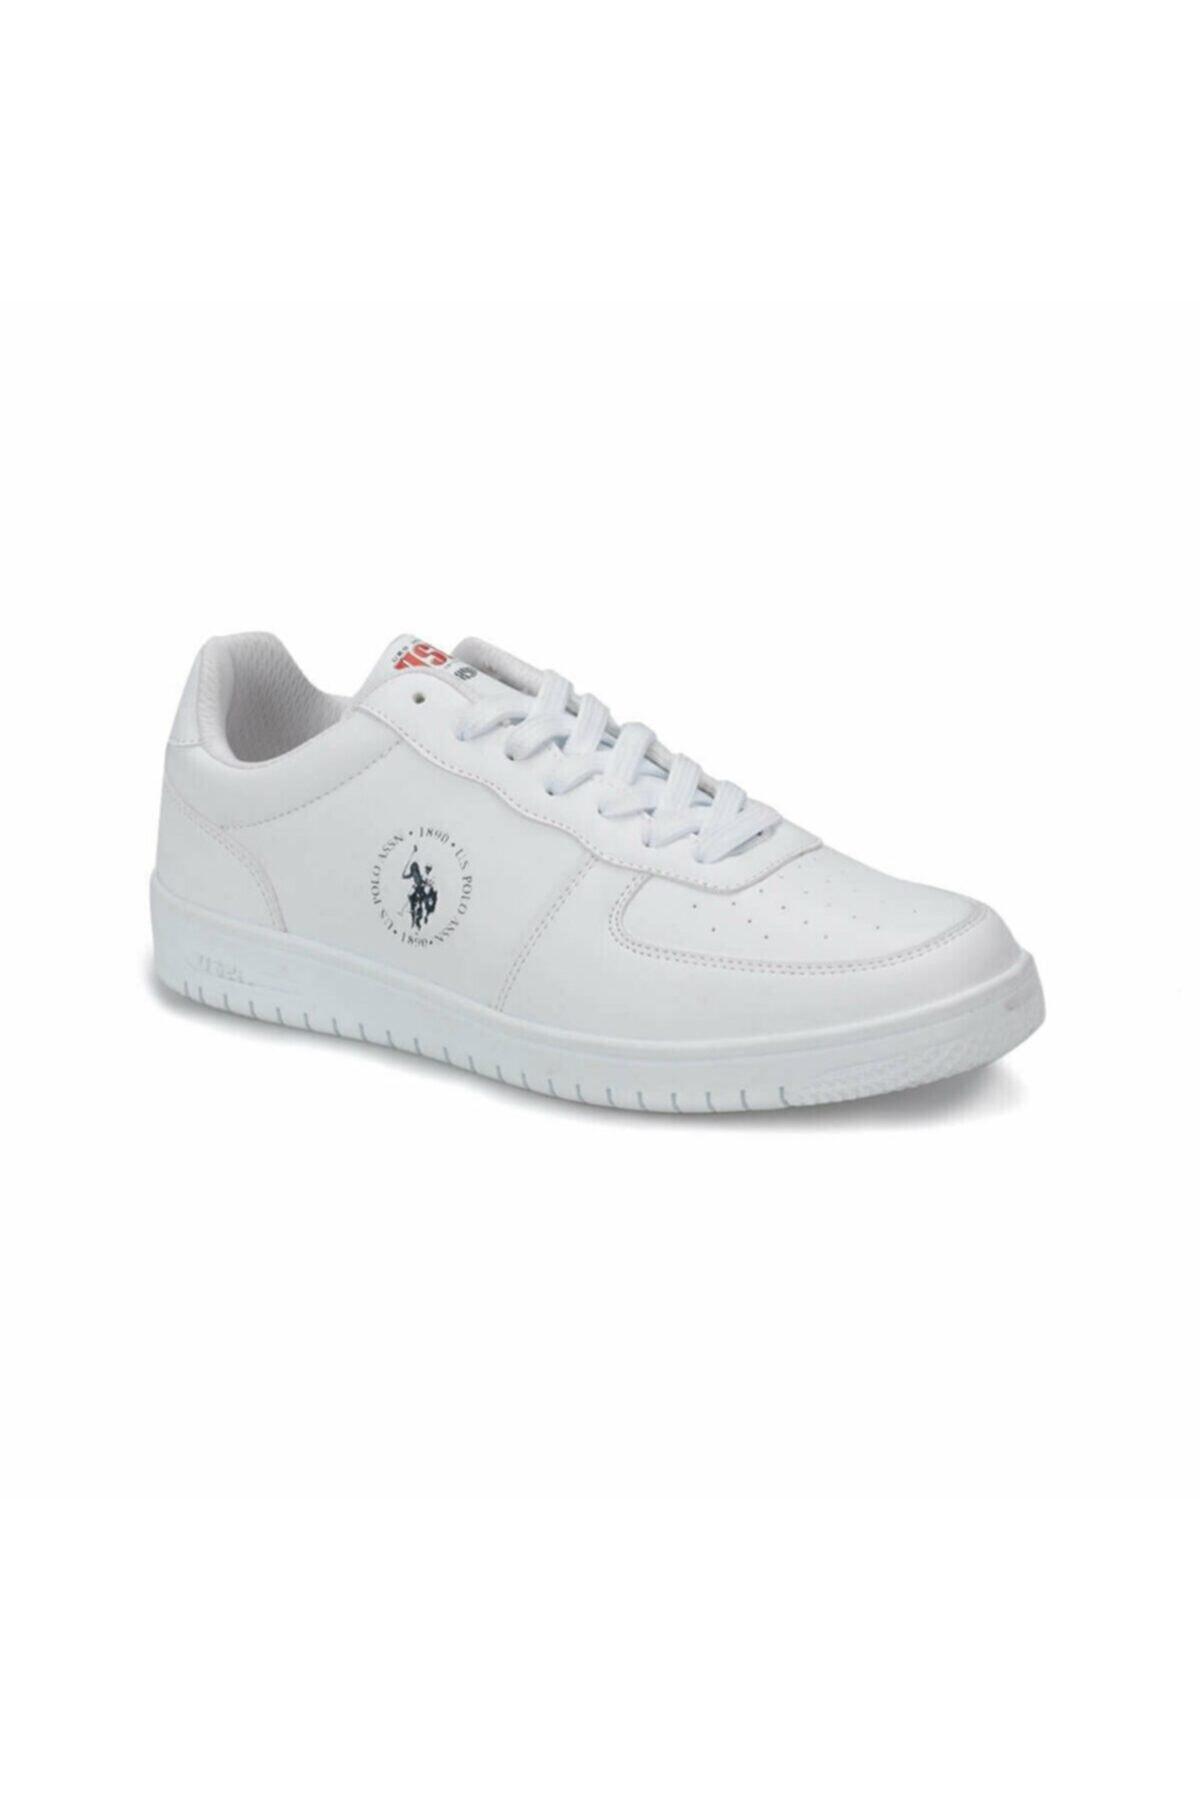 U.S. Polo Assn. Sneakers 1